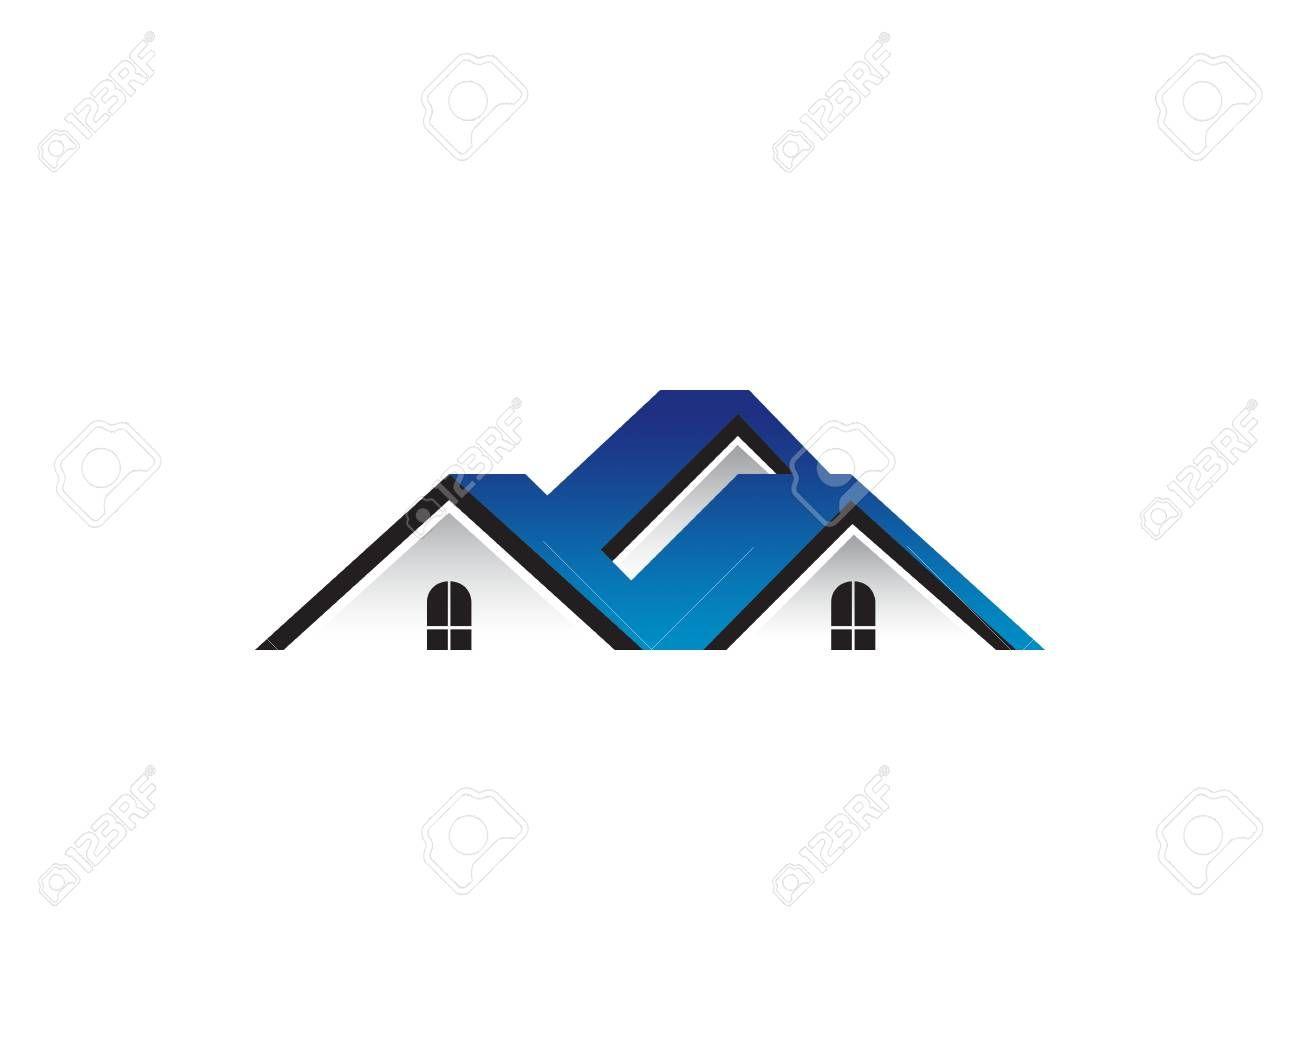 Blue Roof Of Houses Illustration Ad Roof Blue Illustration Houses In 2020 Blue Roof Magazine Template Illustration